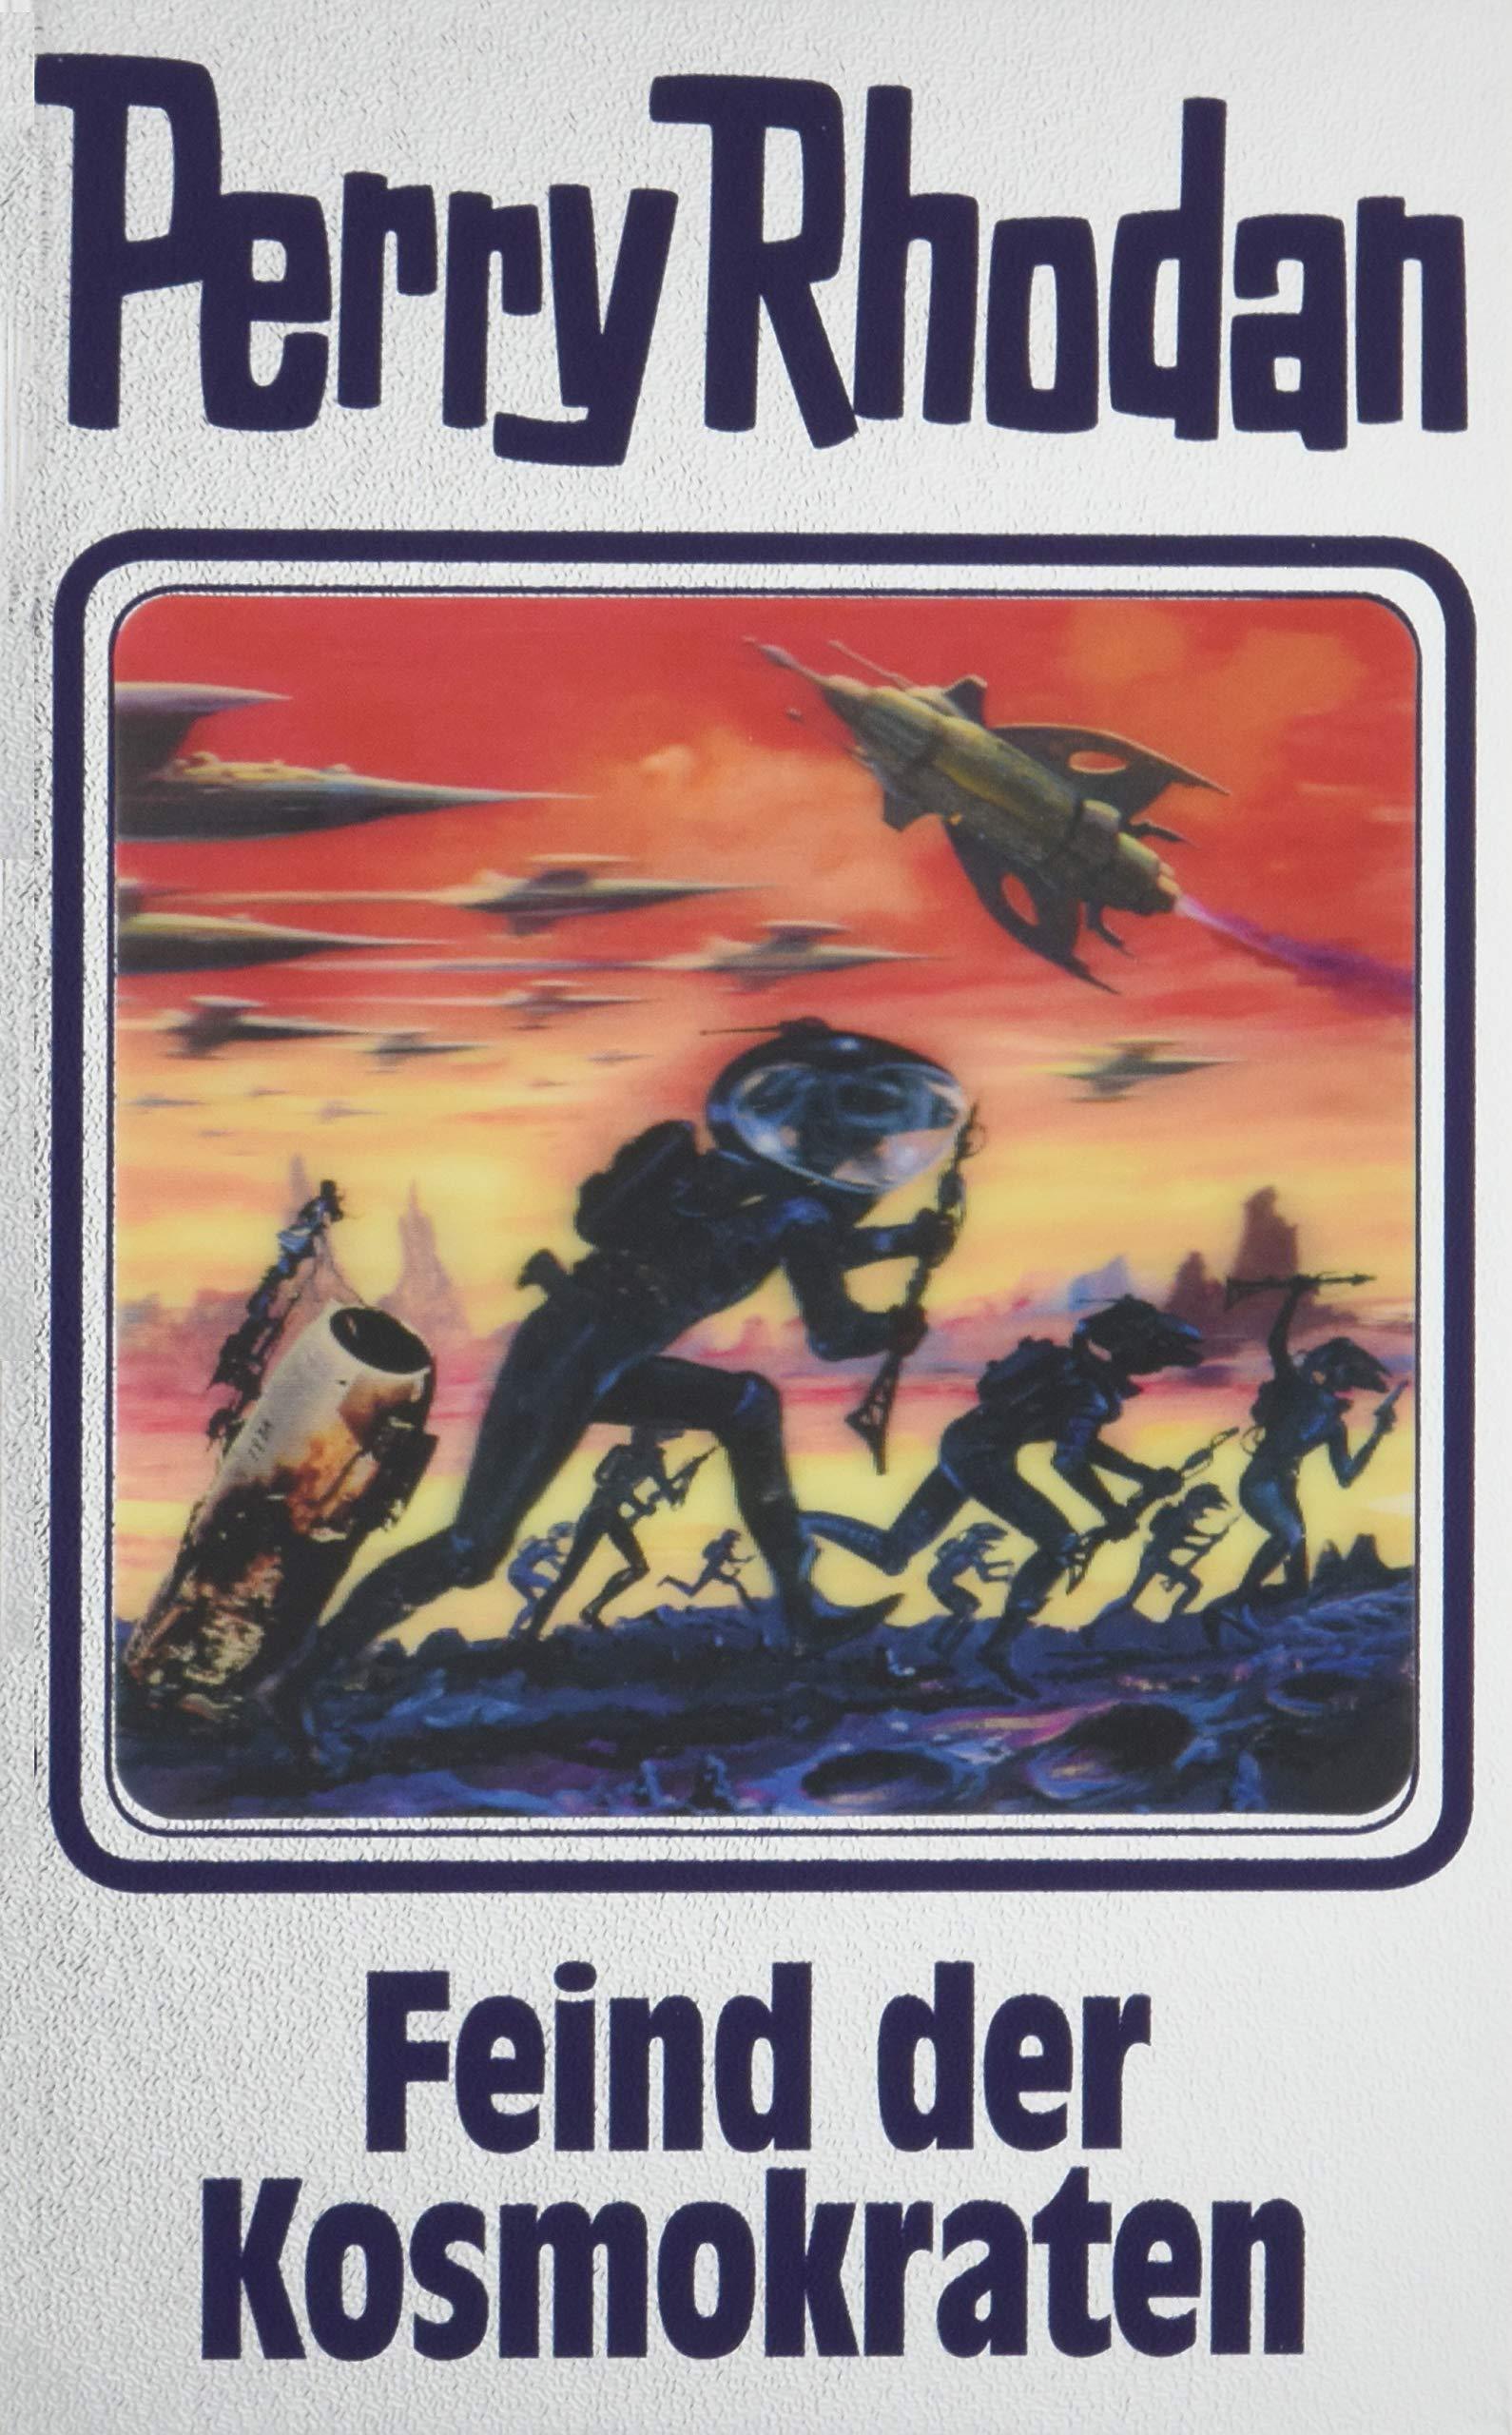 Feind der Kosmokraten: Perry Rhodan Band 141